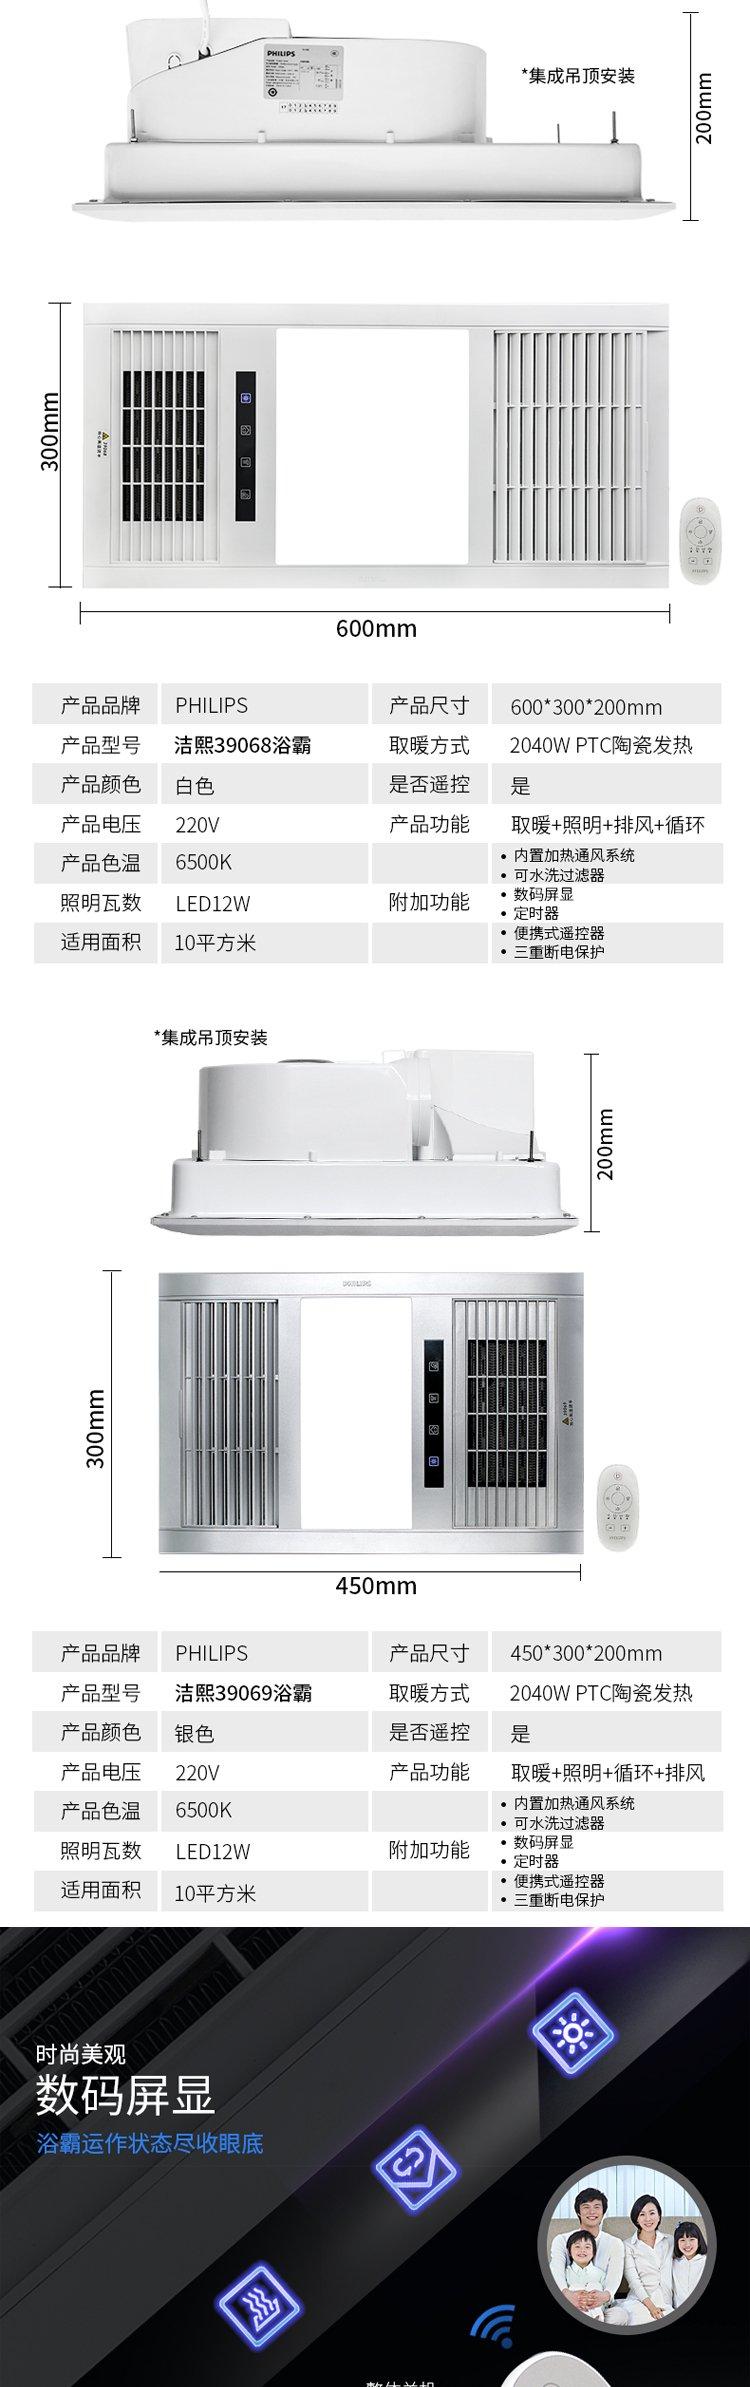 philips 飞利浦 洁熙led集成吊顶遥控数码版浴霸 ptc暖风空调型 含